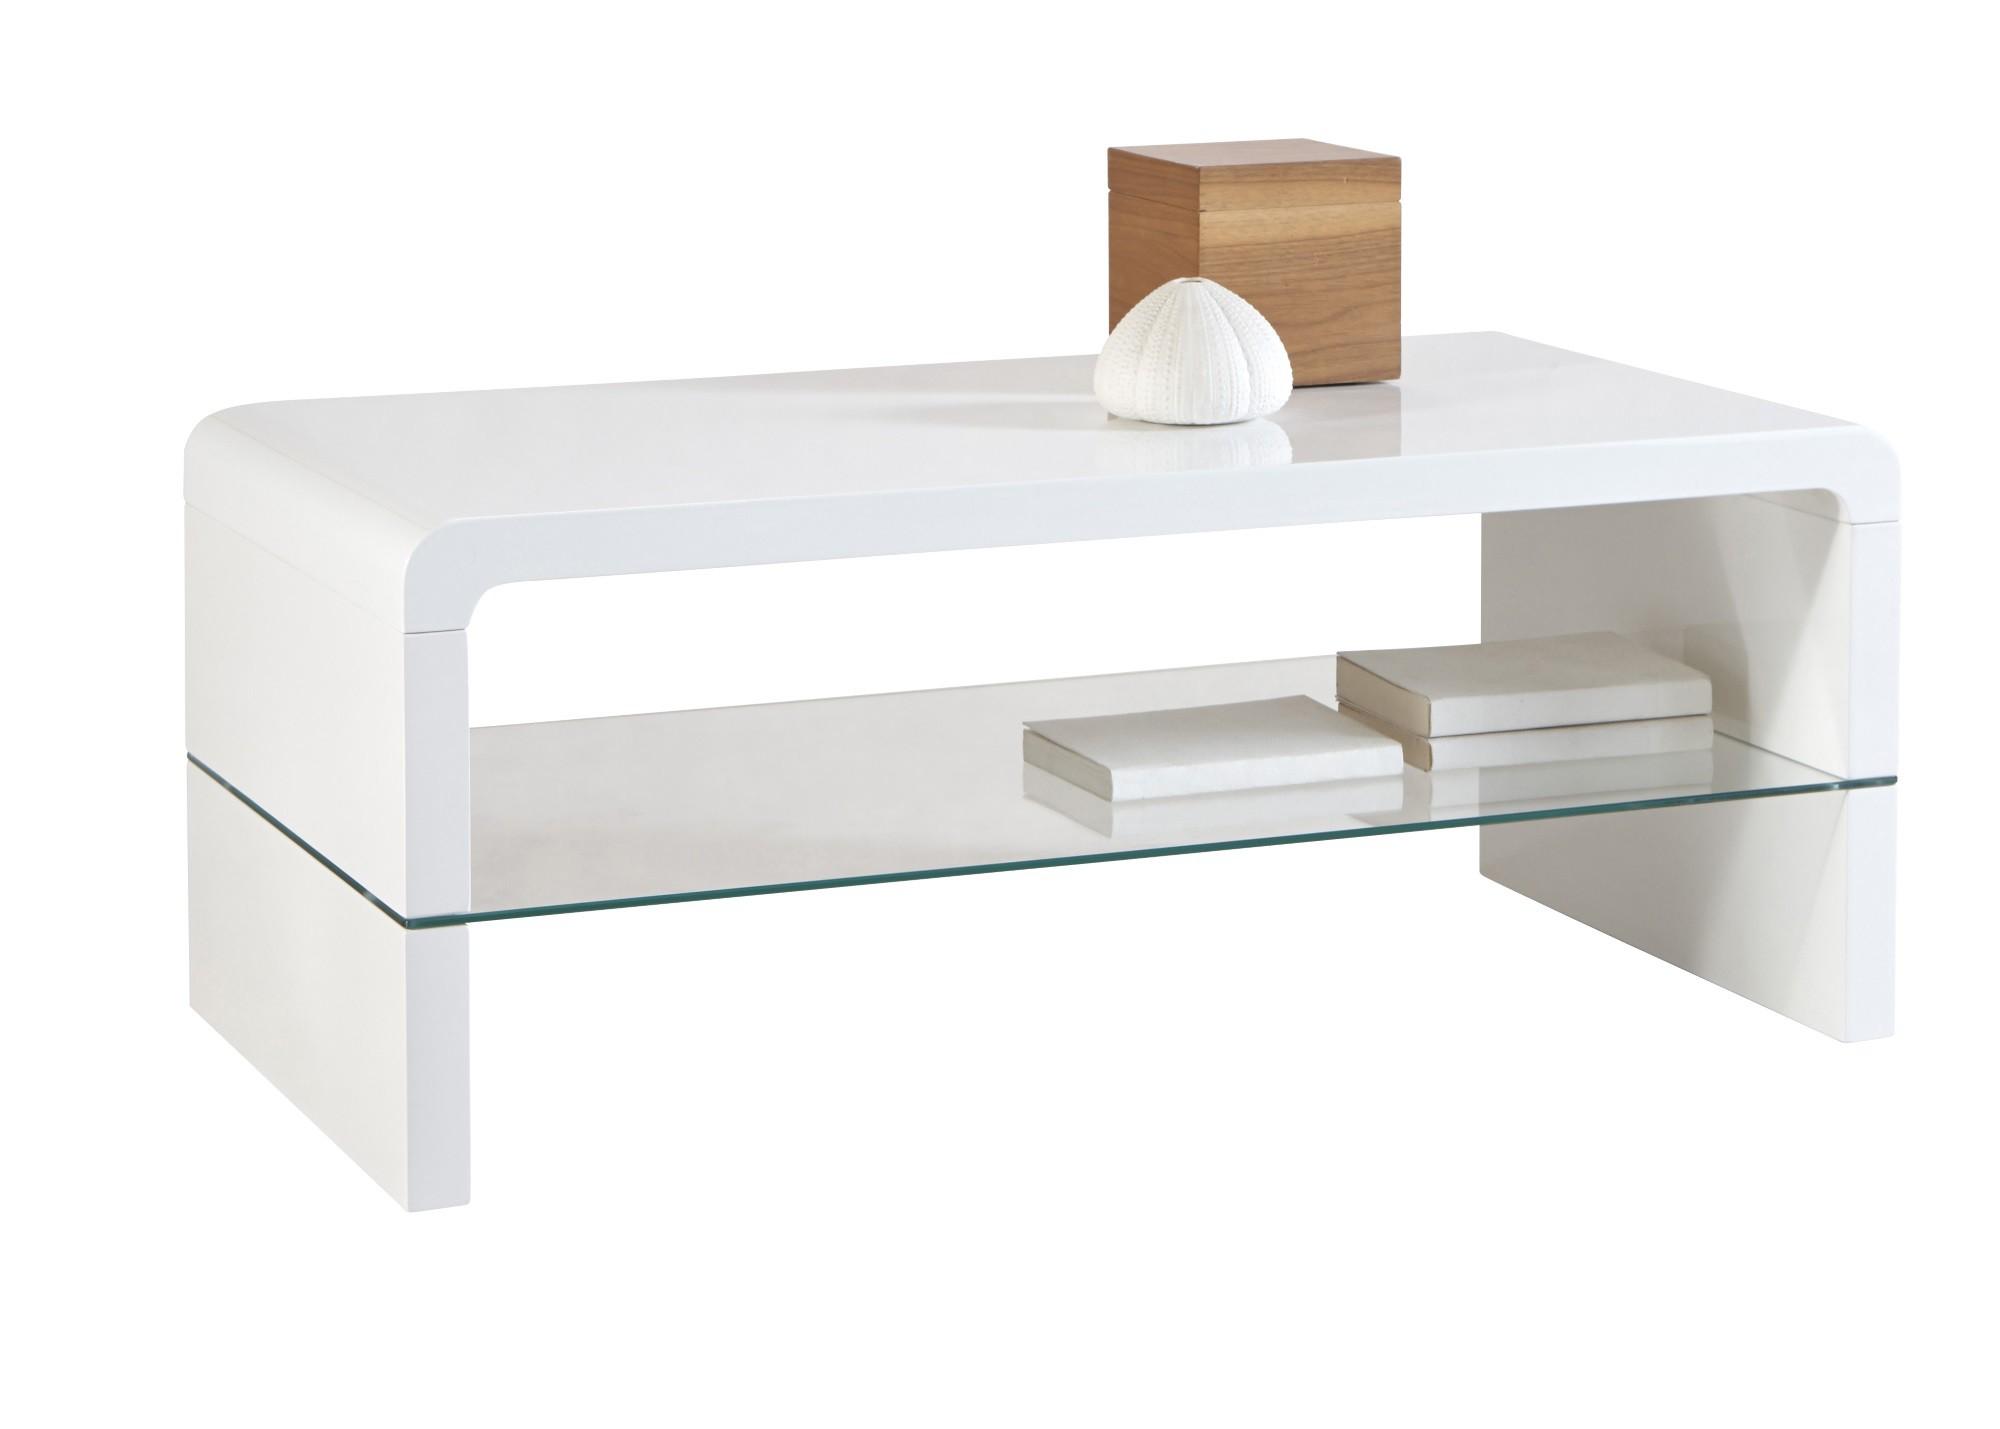 Table basse blanc laque pas cher cheap table basse atlas - Table basse design pas cher blanc ...